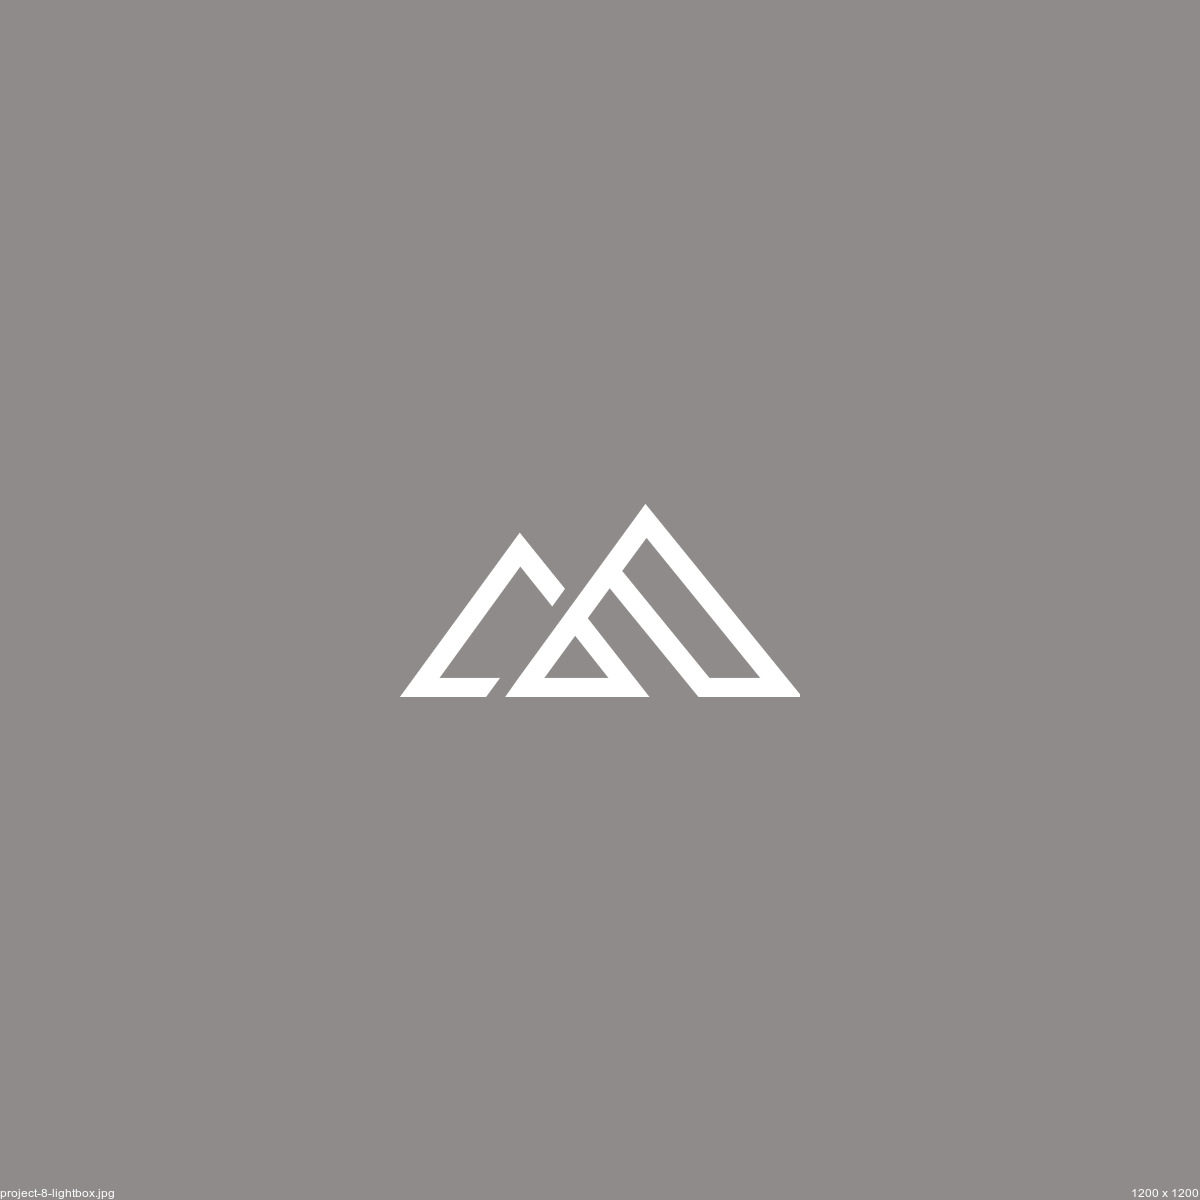 project-8-lightbox